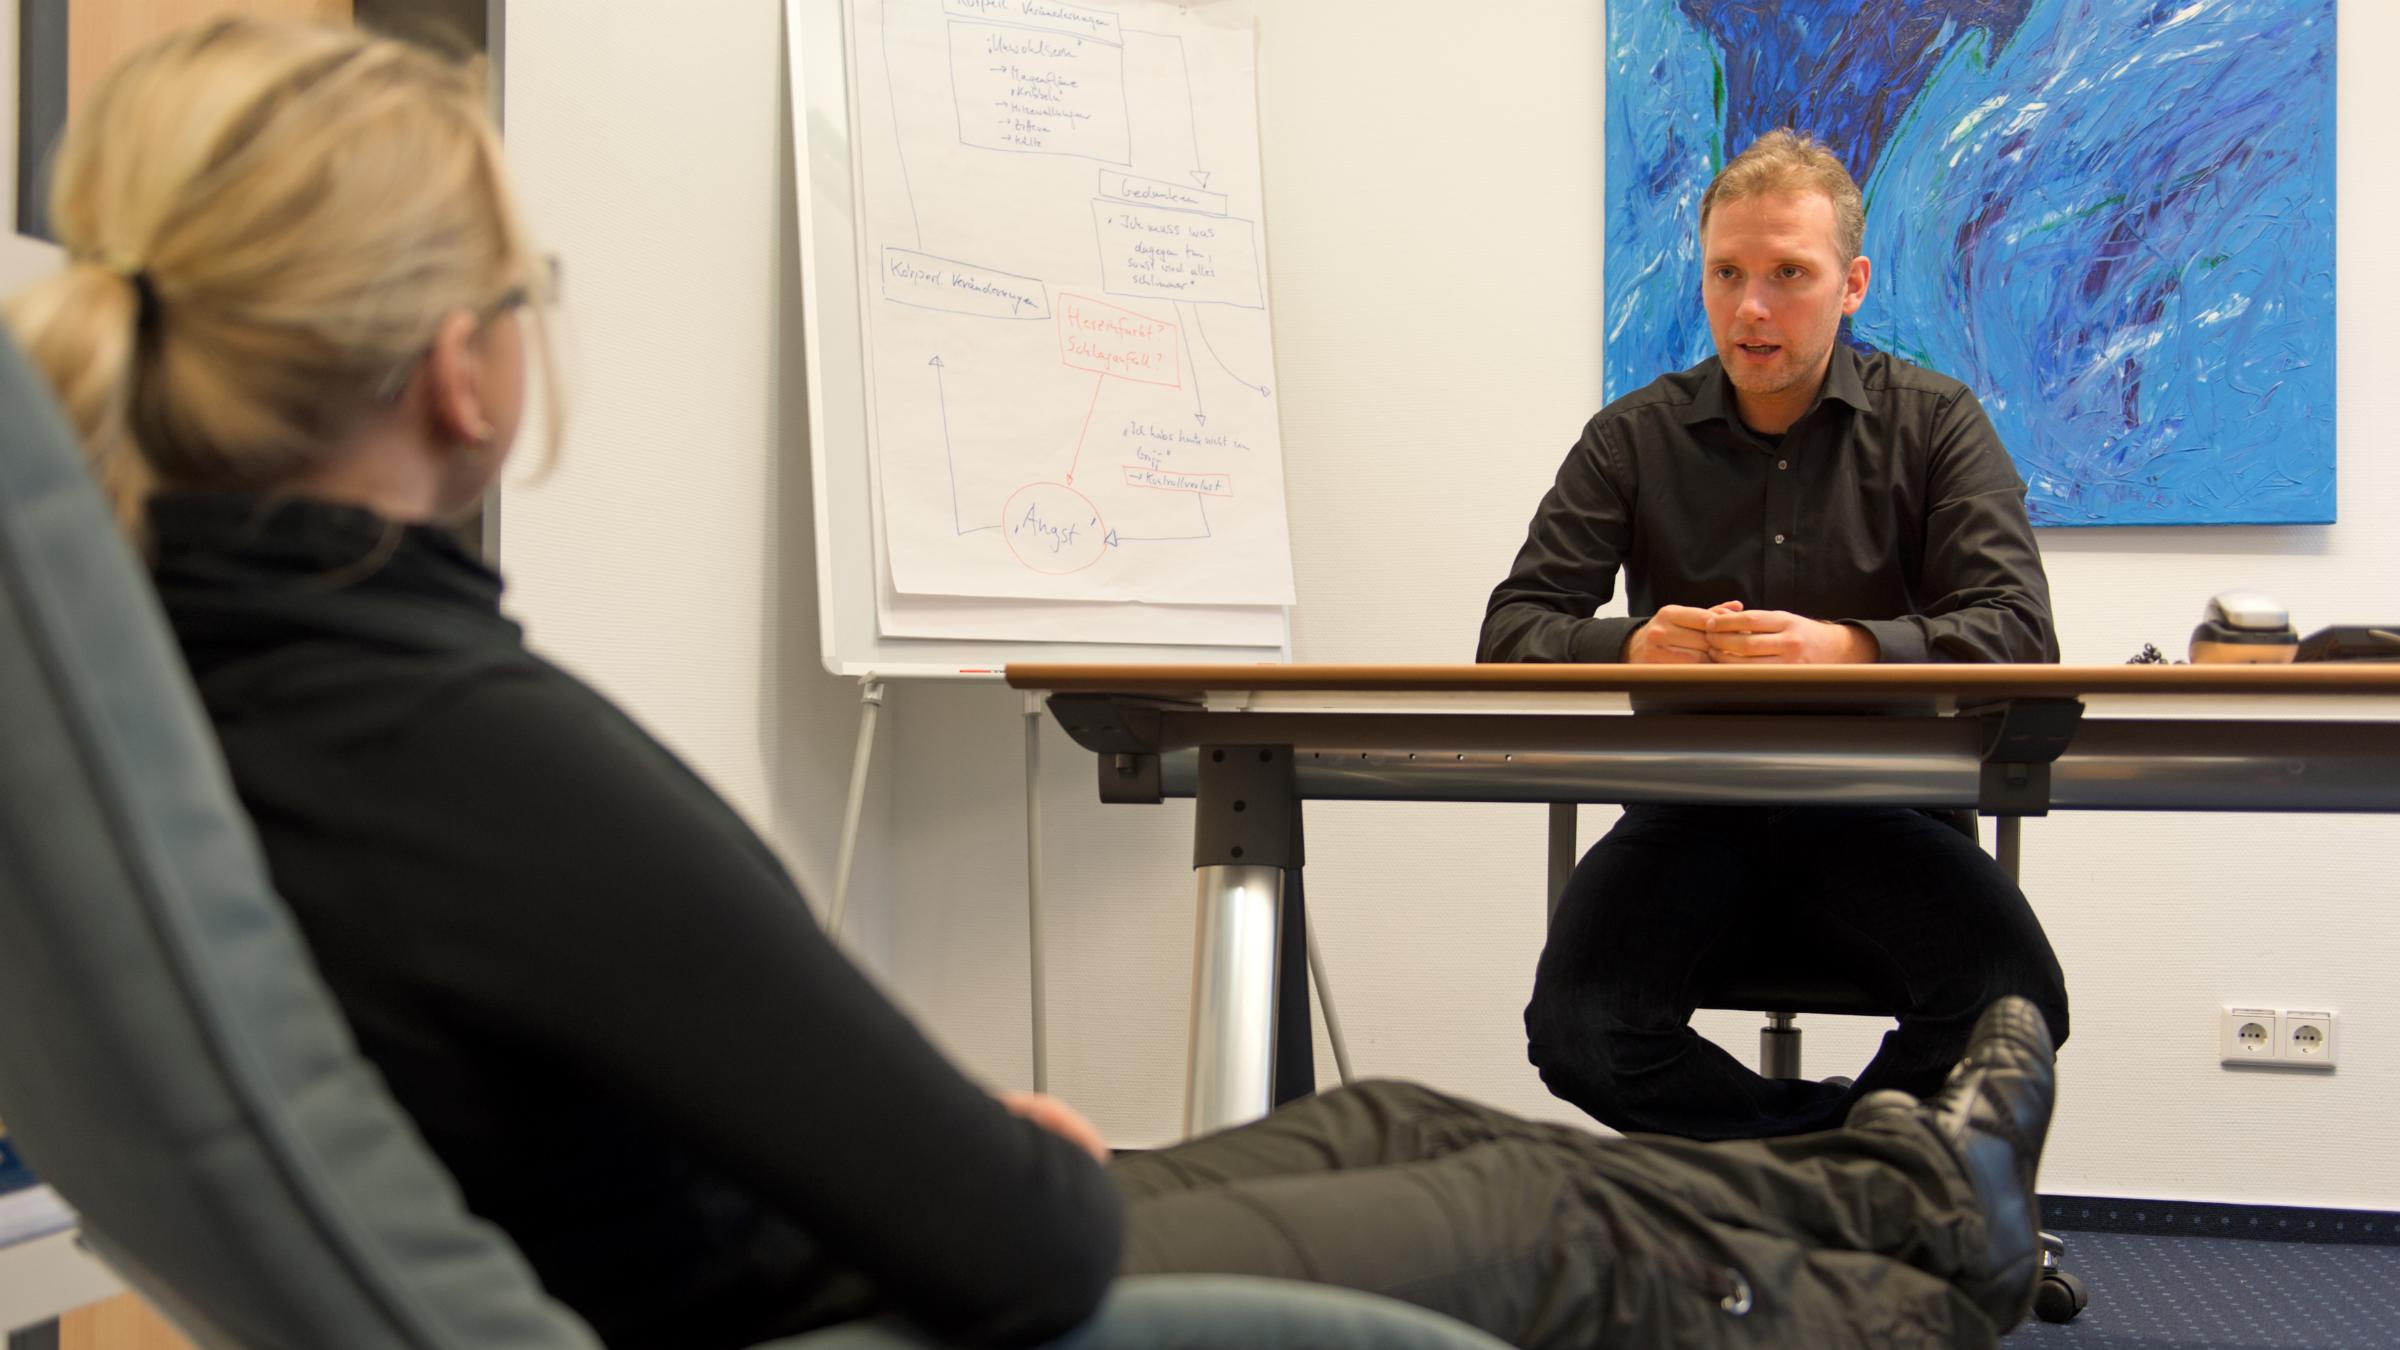 Psychologist session